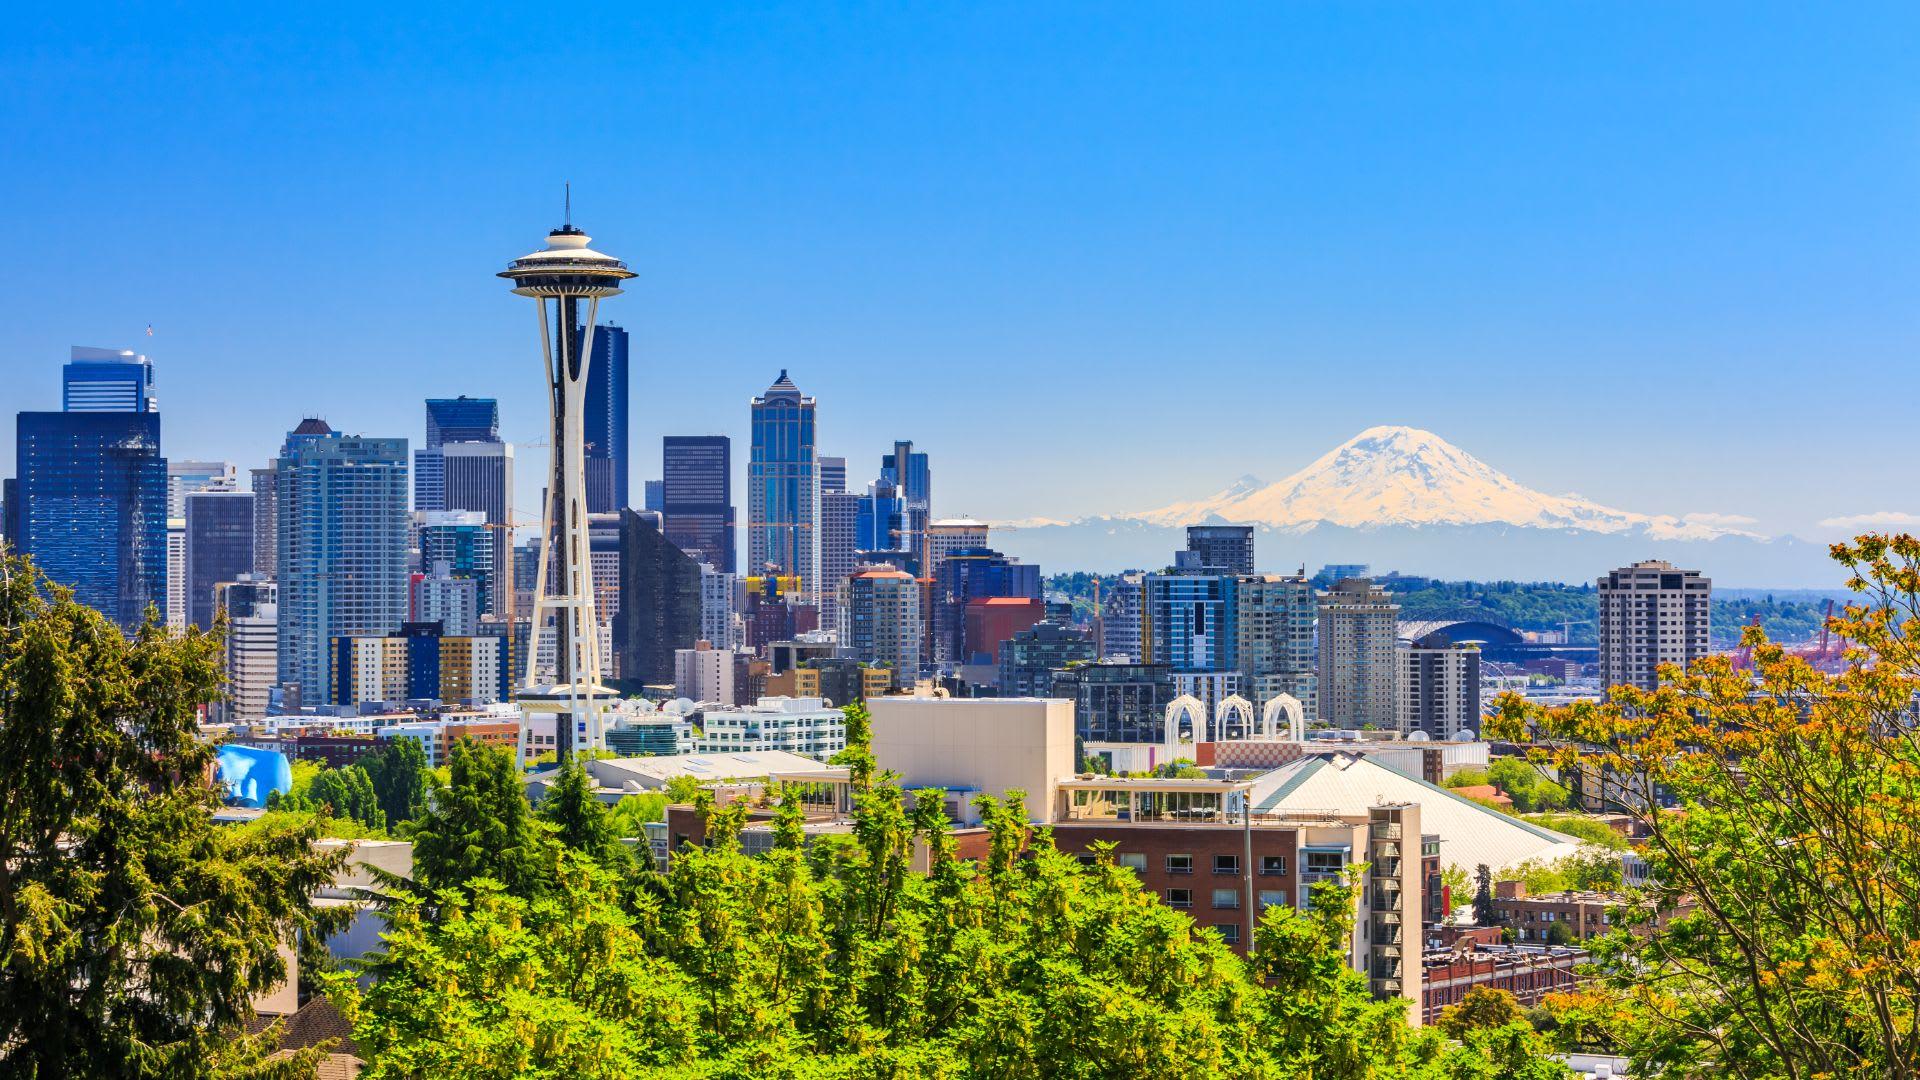 Seattle image